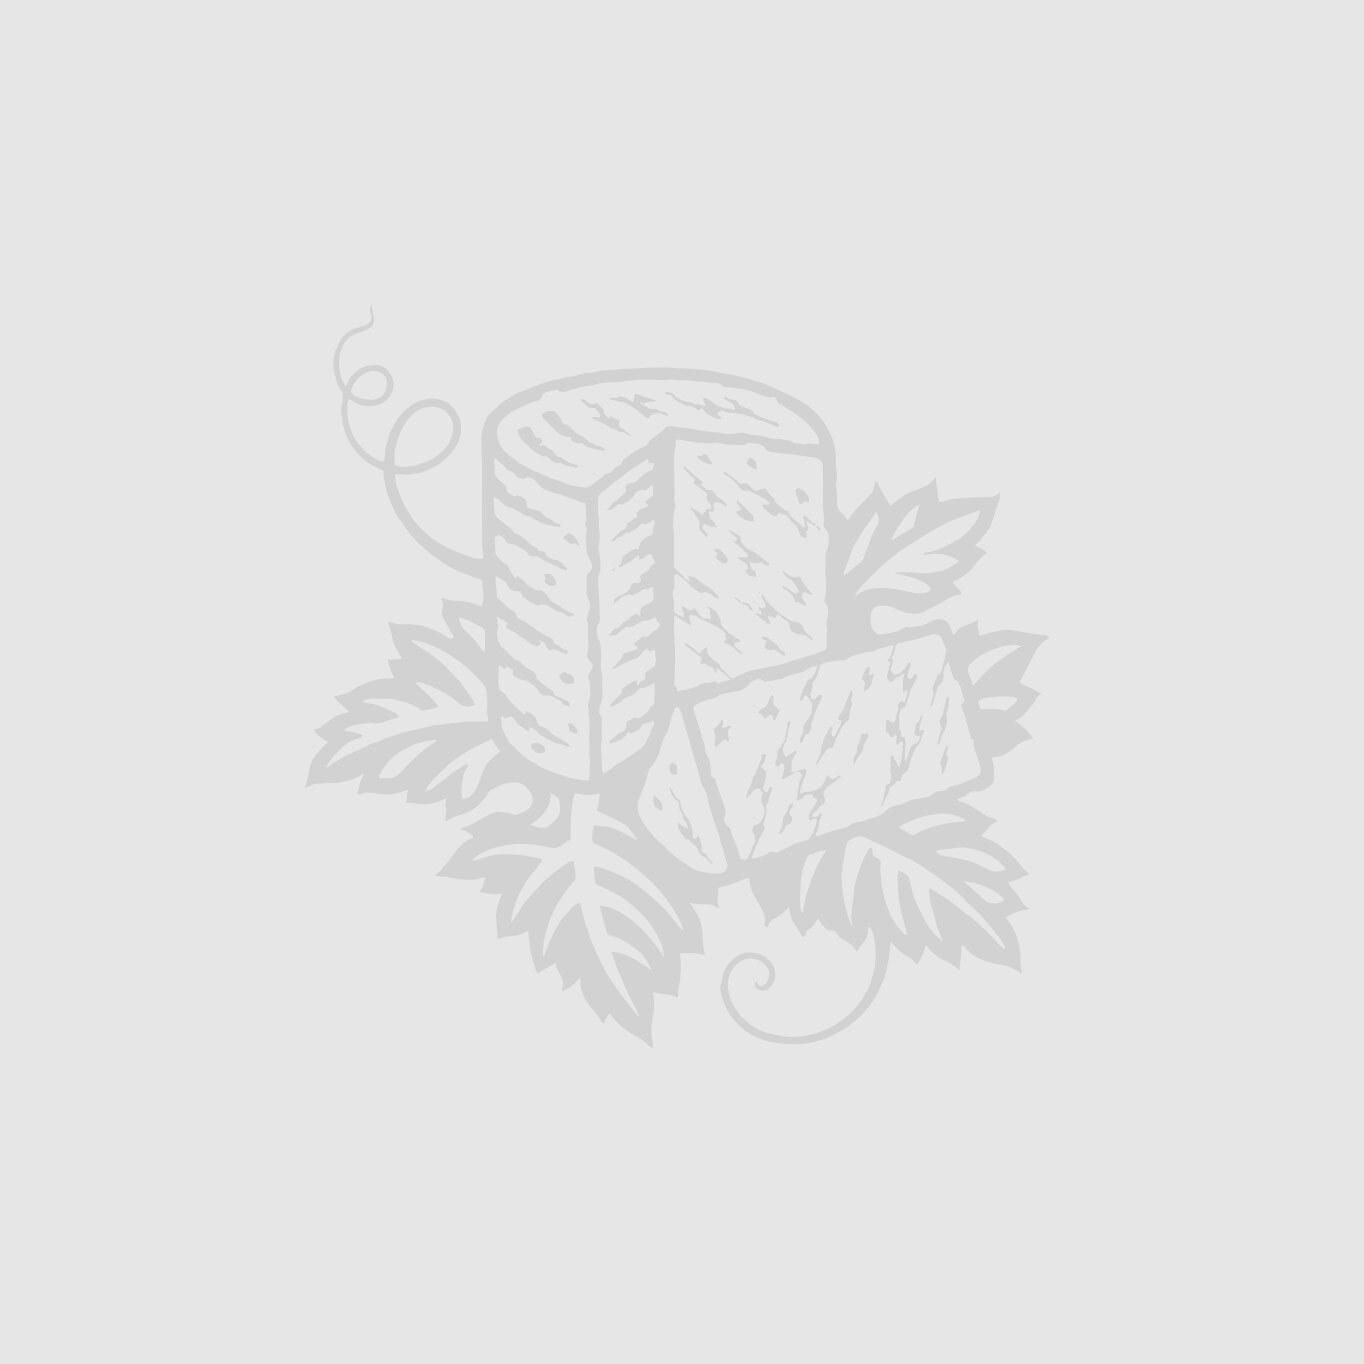 Pitchfork Somerset Cheddar